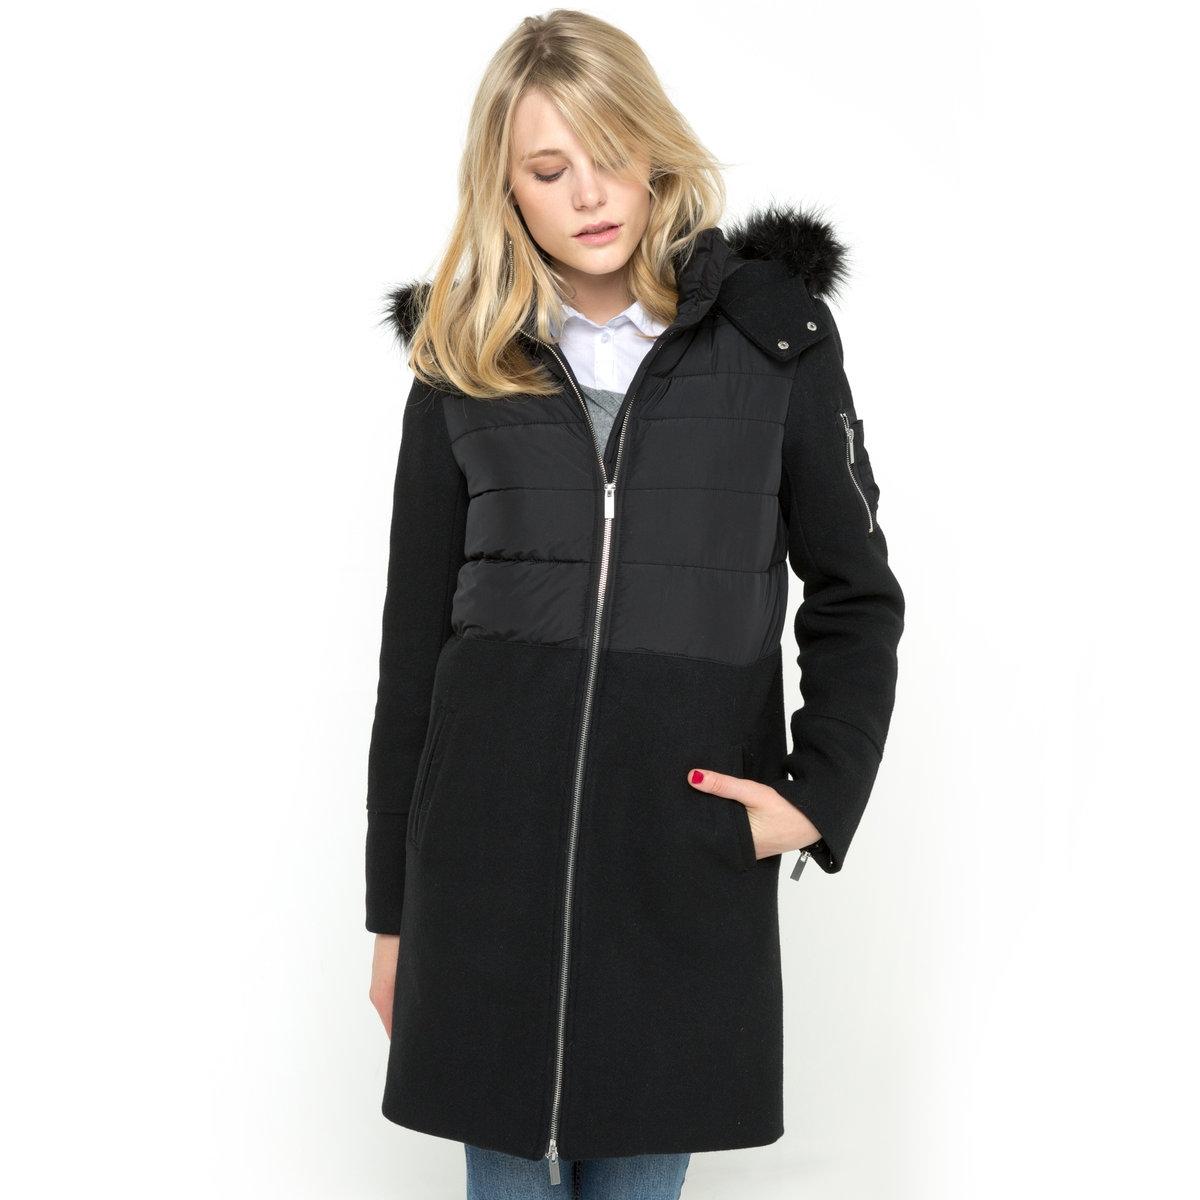 Пальто из двух материалов от La Redoute